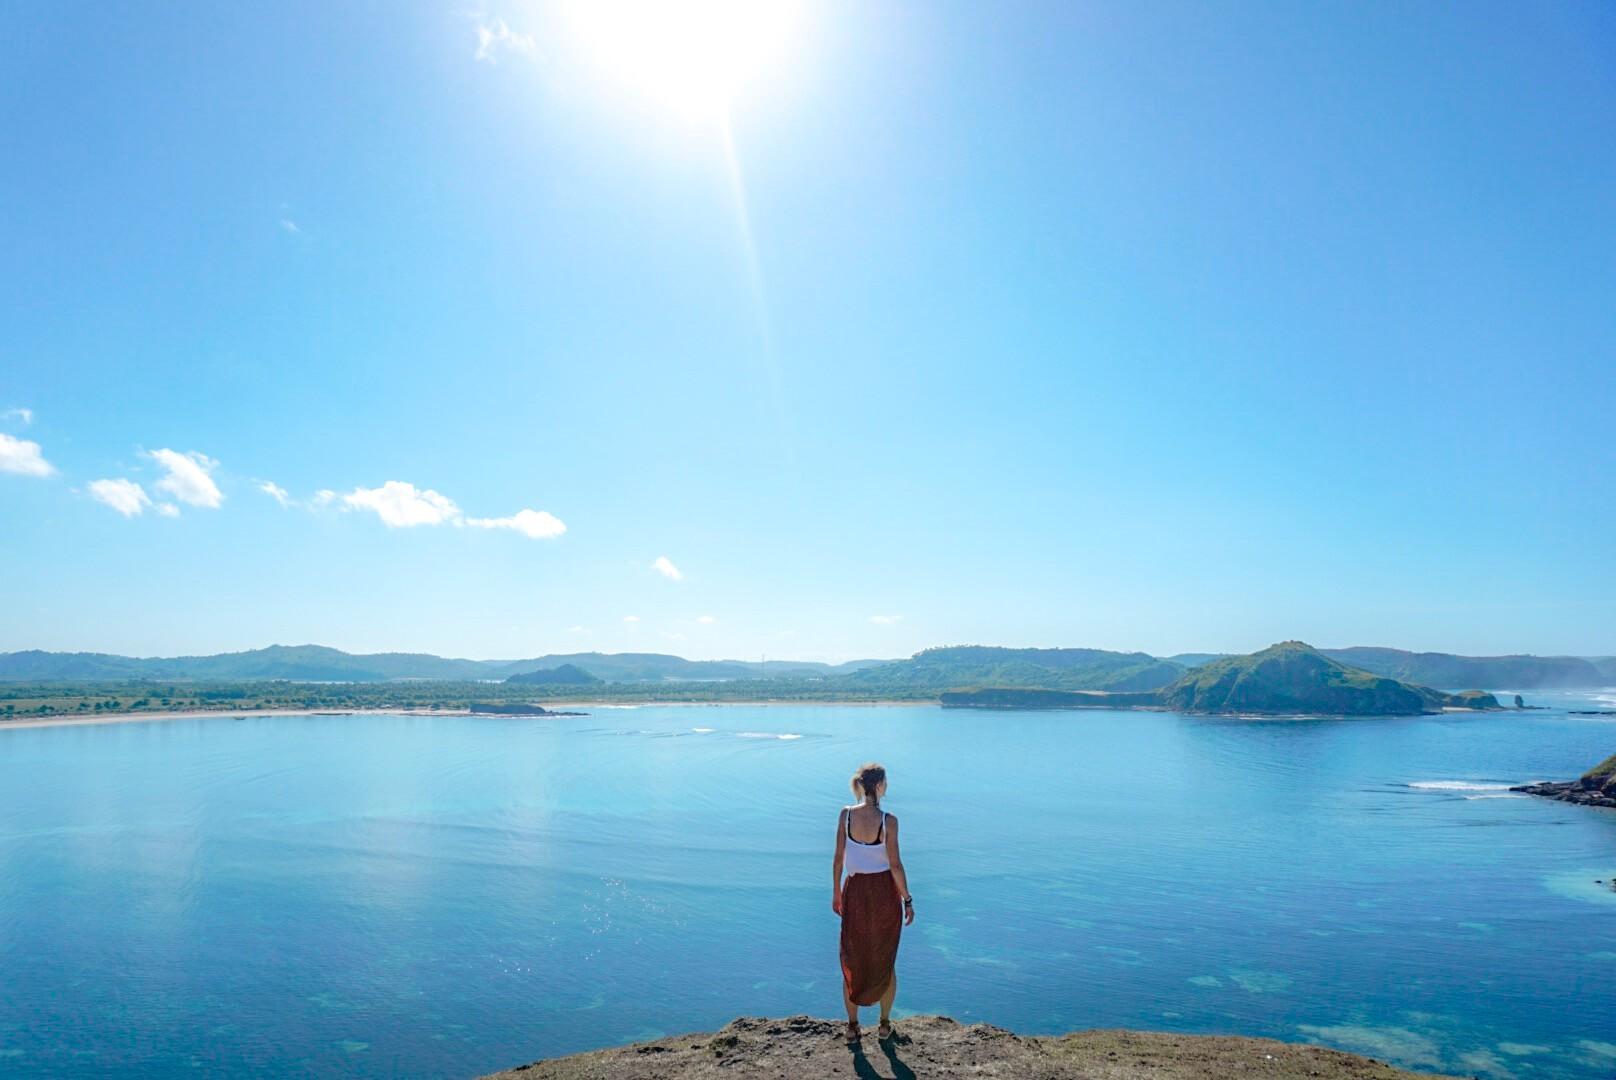 comment aller baie merese hill lombok visiter